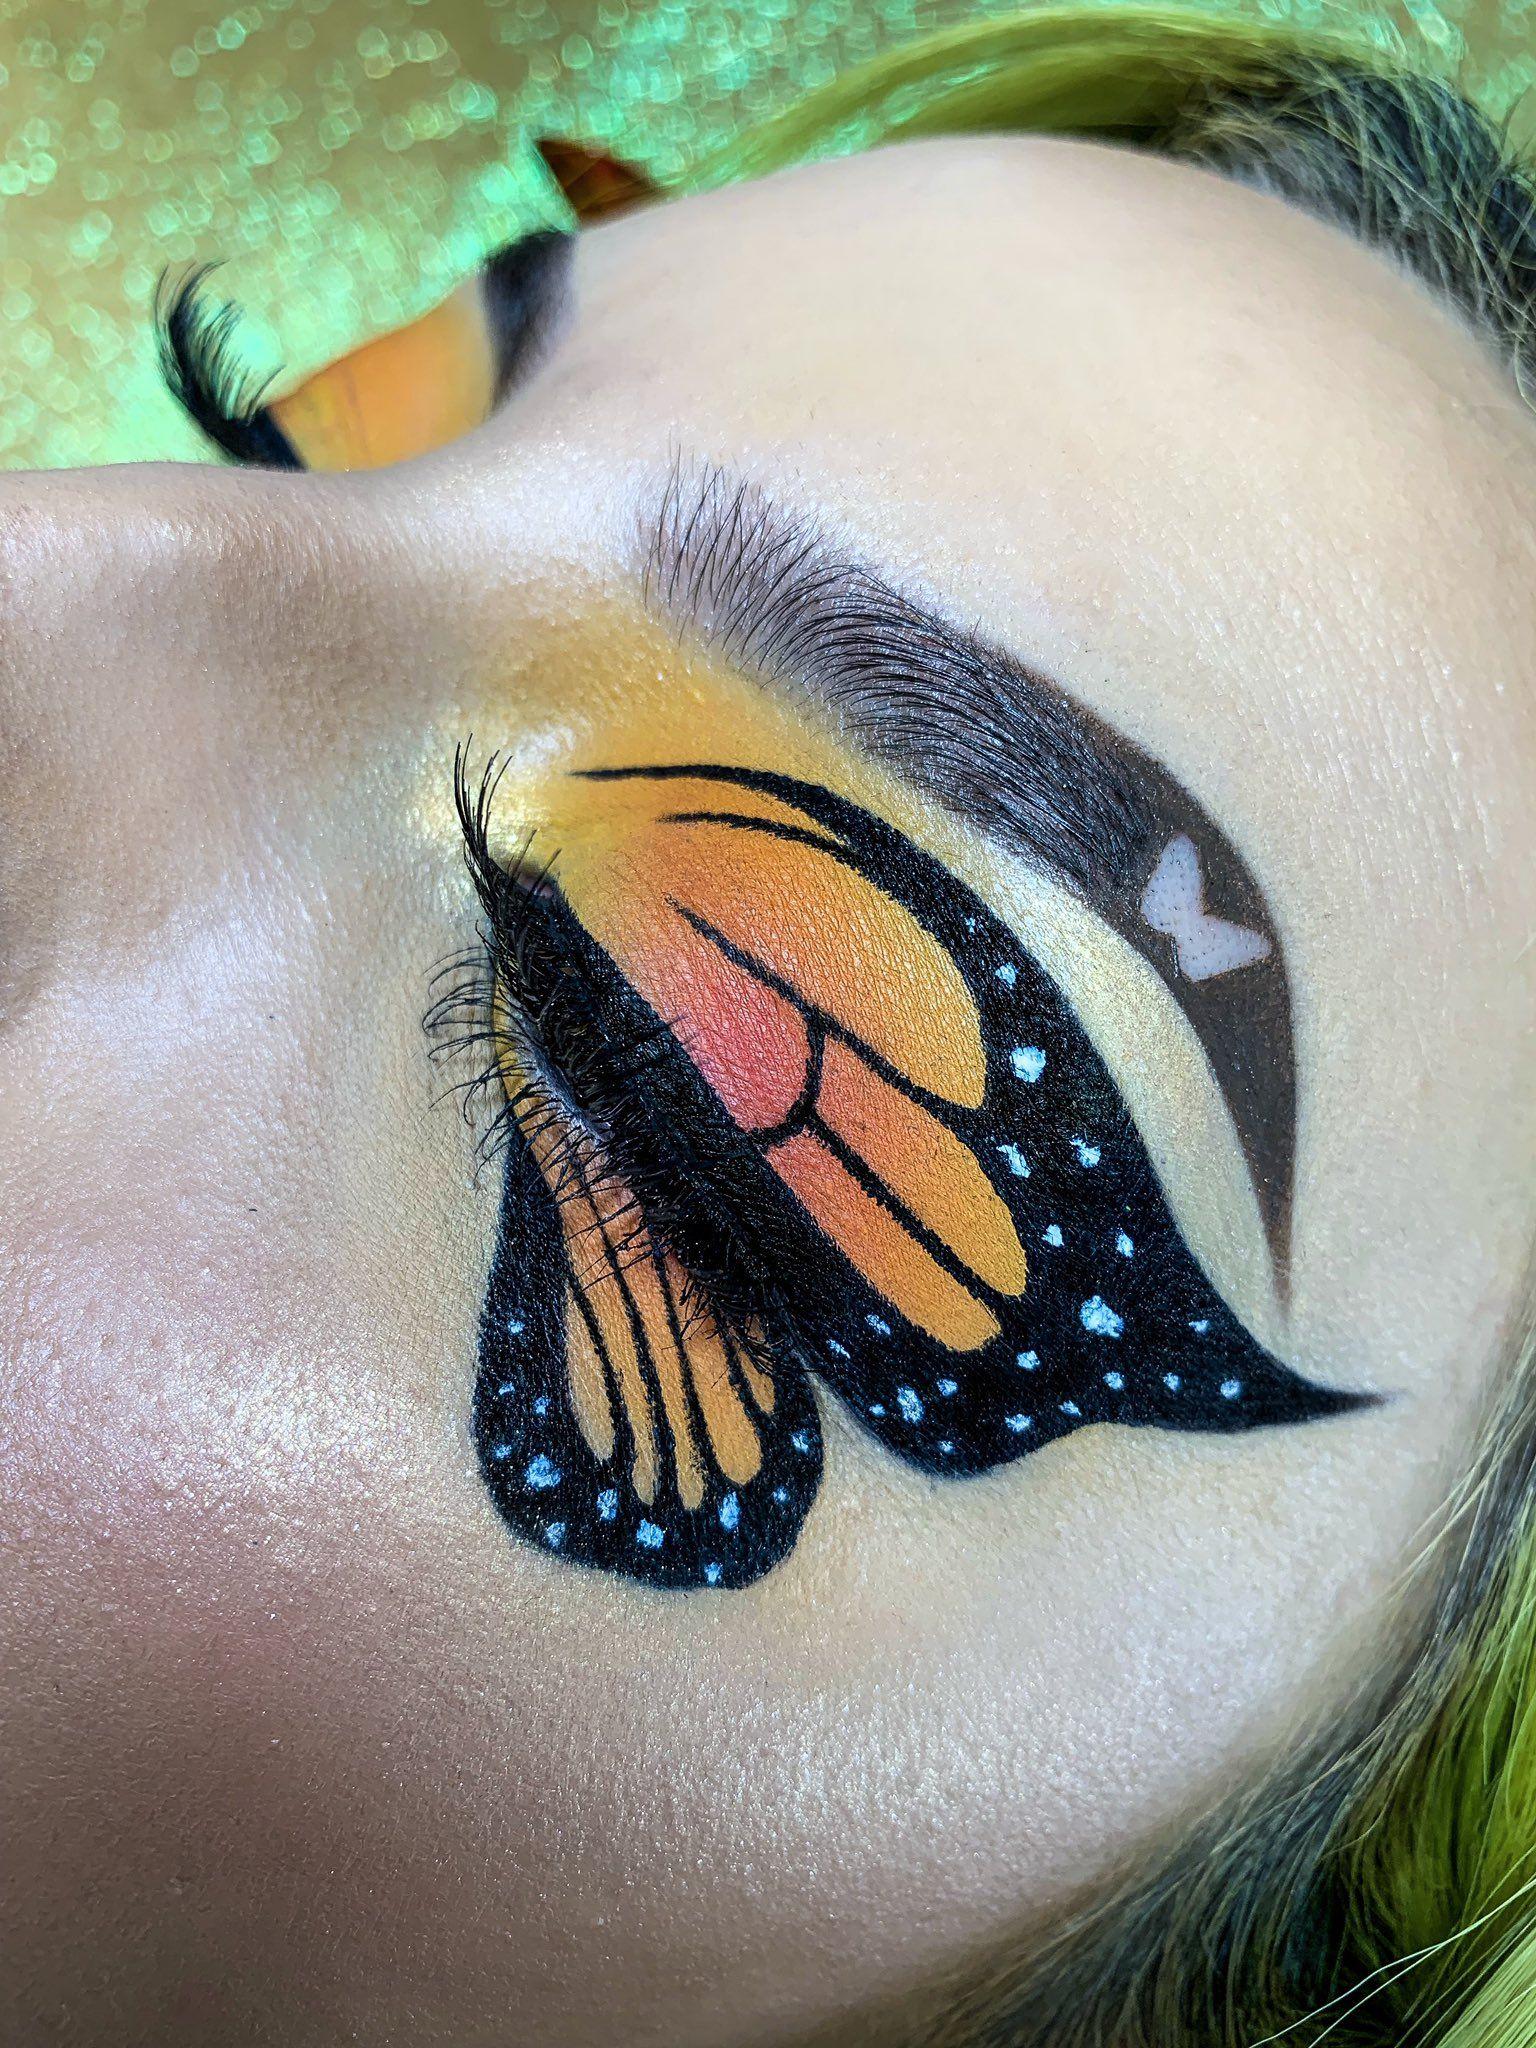 Vickory On Twitter Butterfly Makeup Creative Eye Makeup Eye Makeup Art